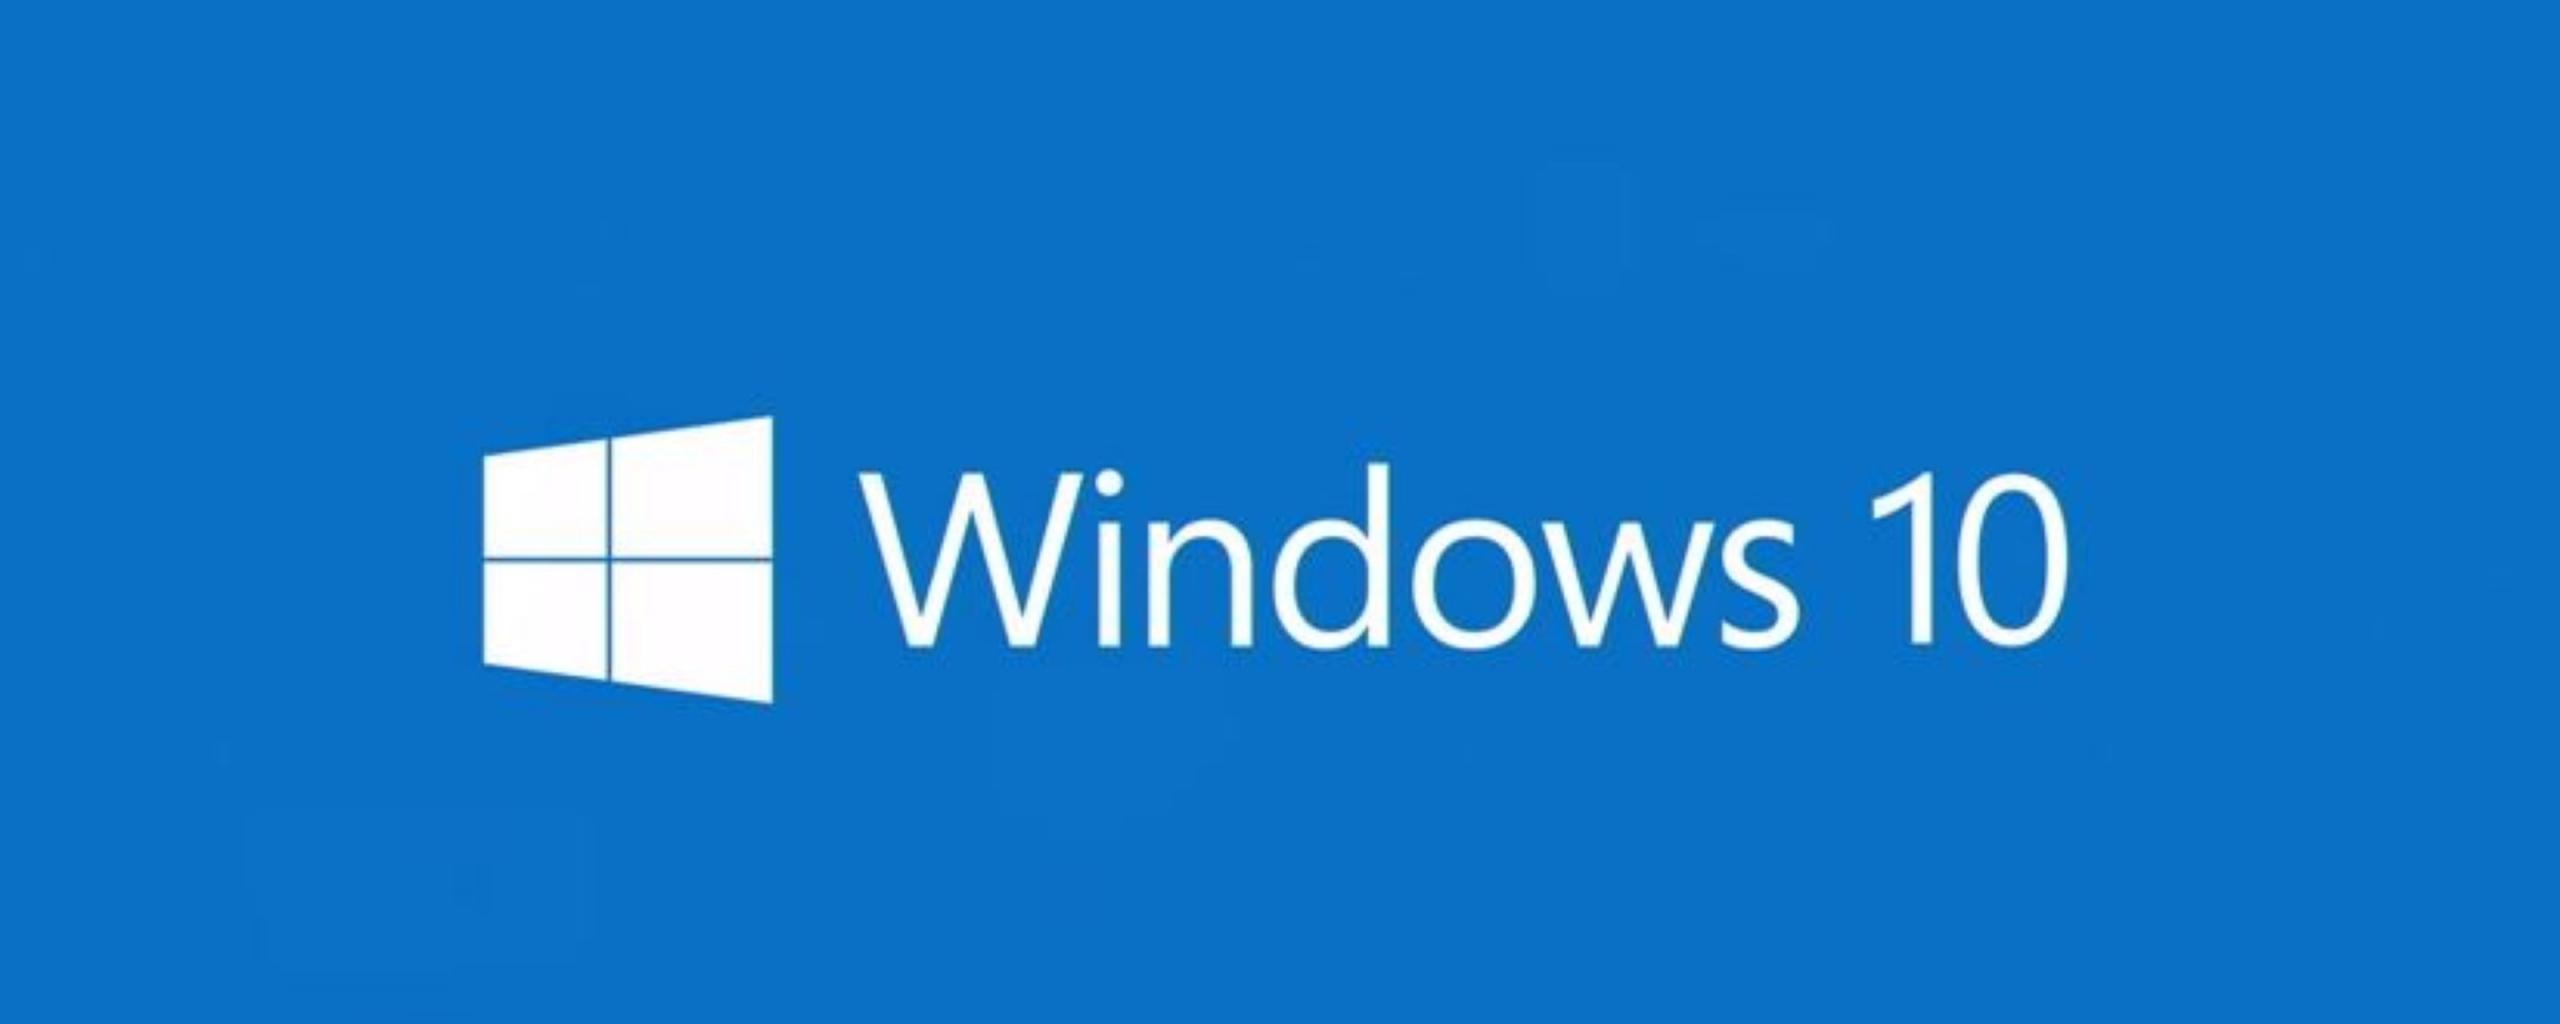 2560x1024 Wallpaper windows 10 technical preview windows 10 logo 2560x1024